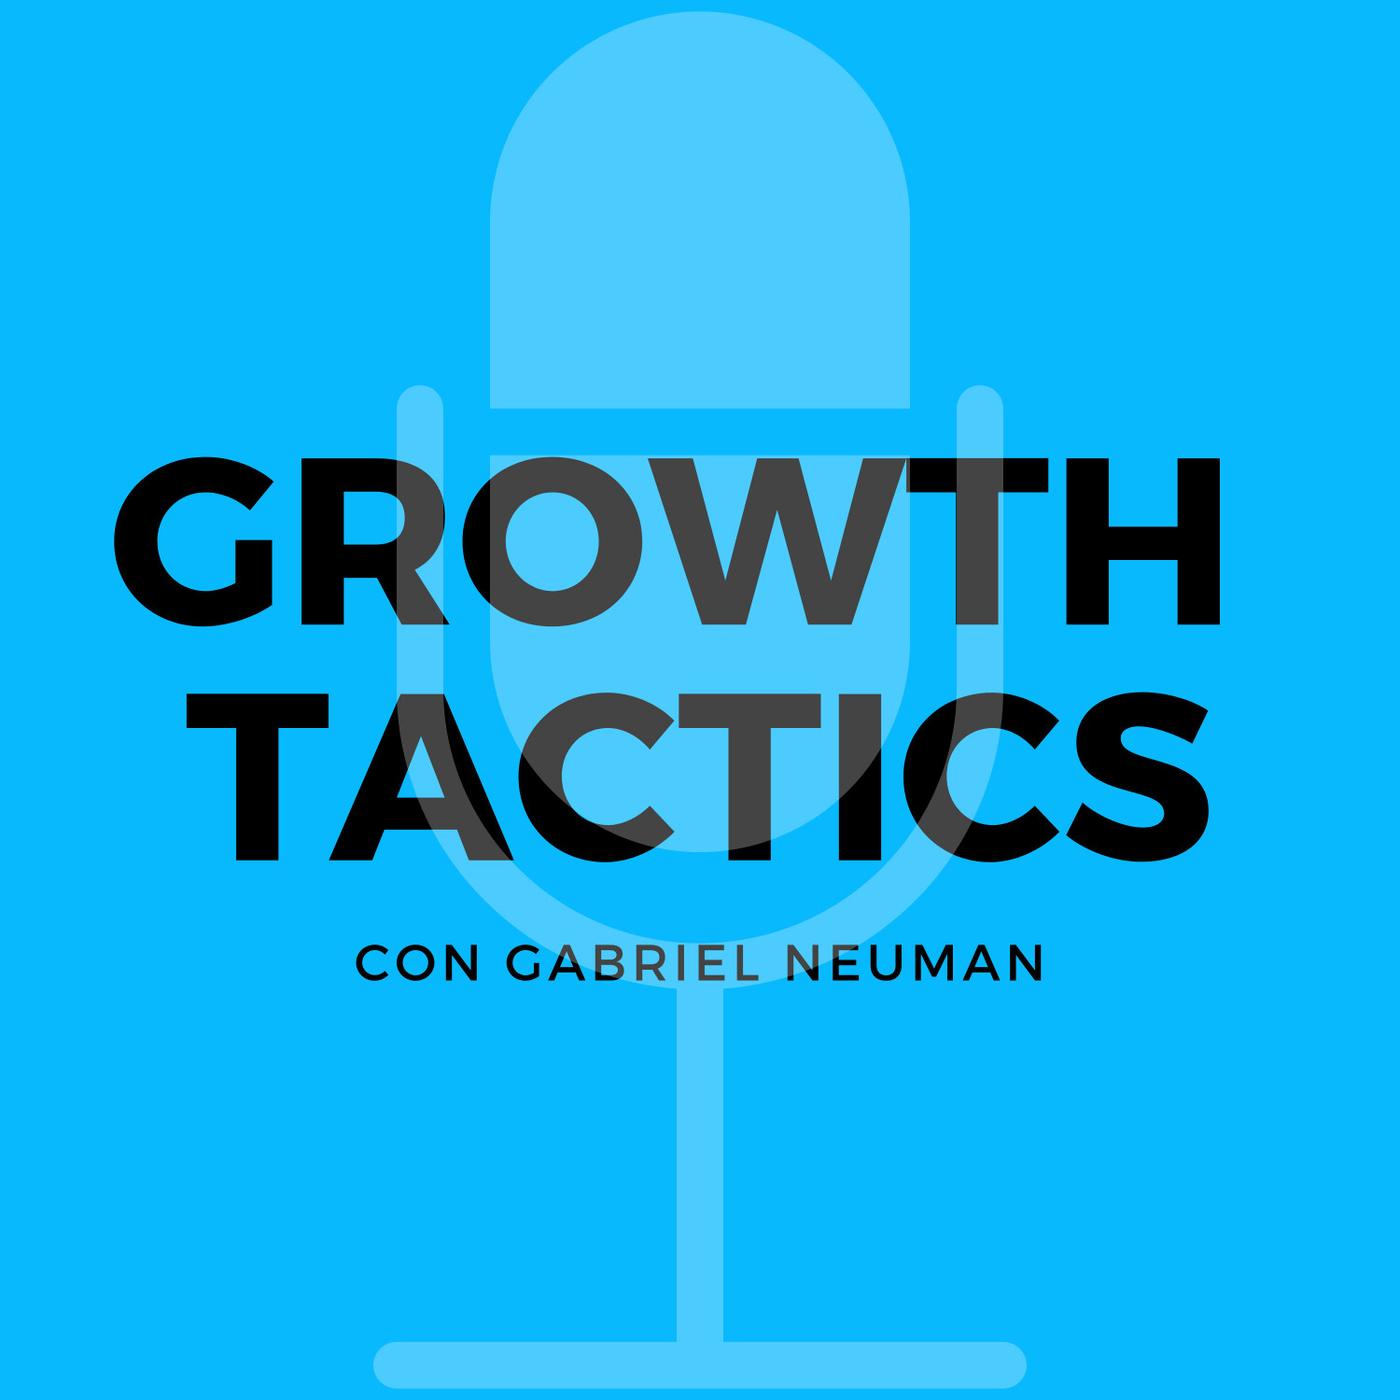 Growth Tactics con Gabriel Neuman